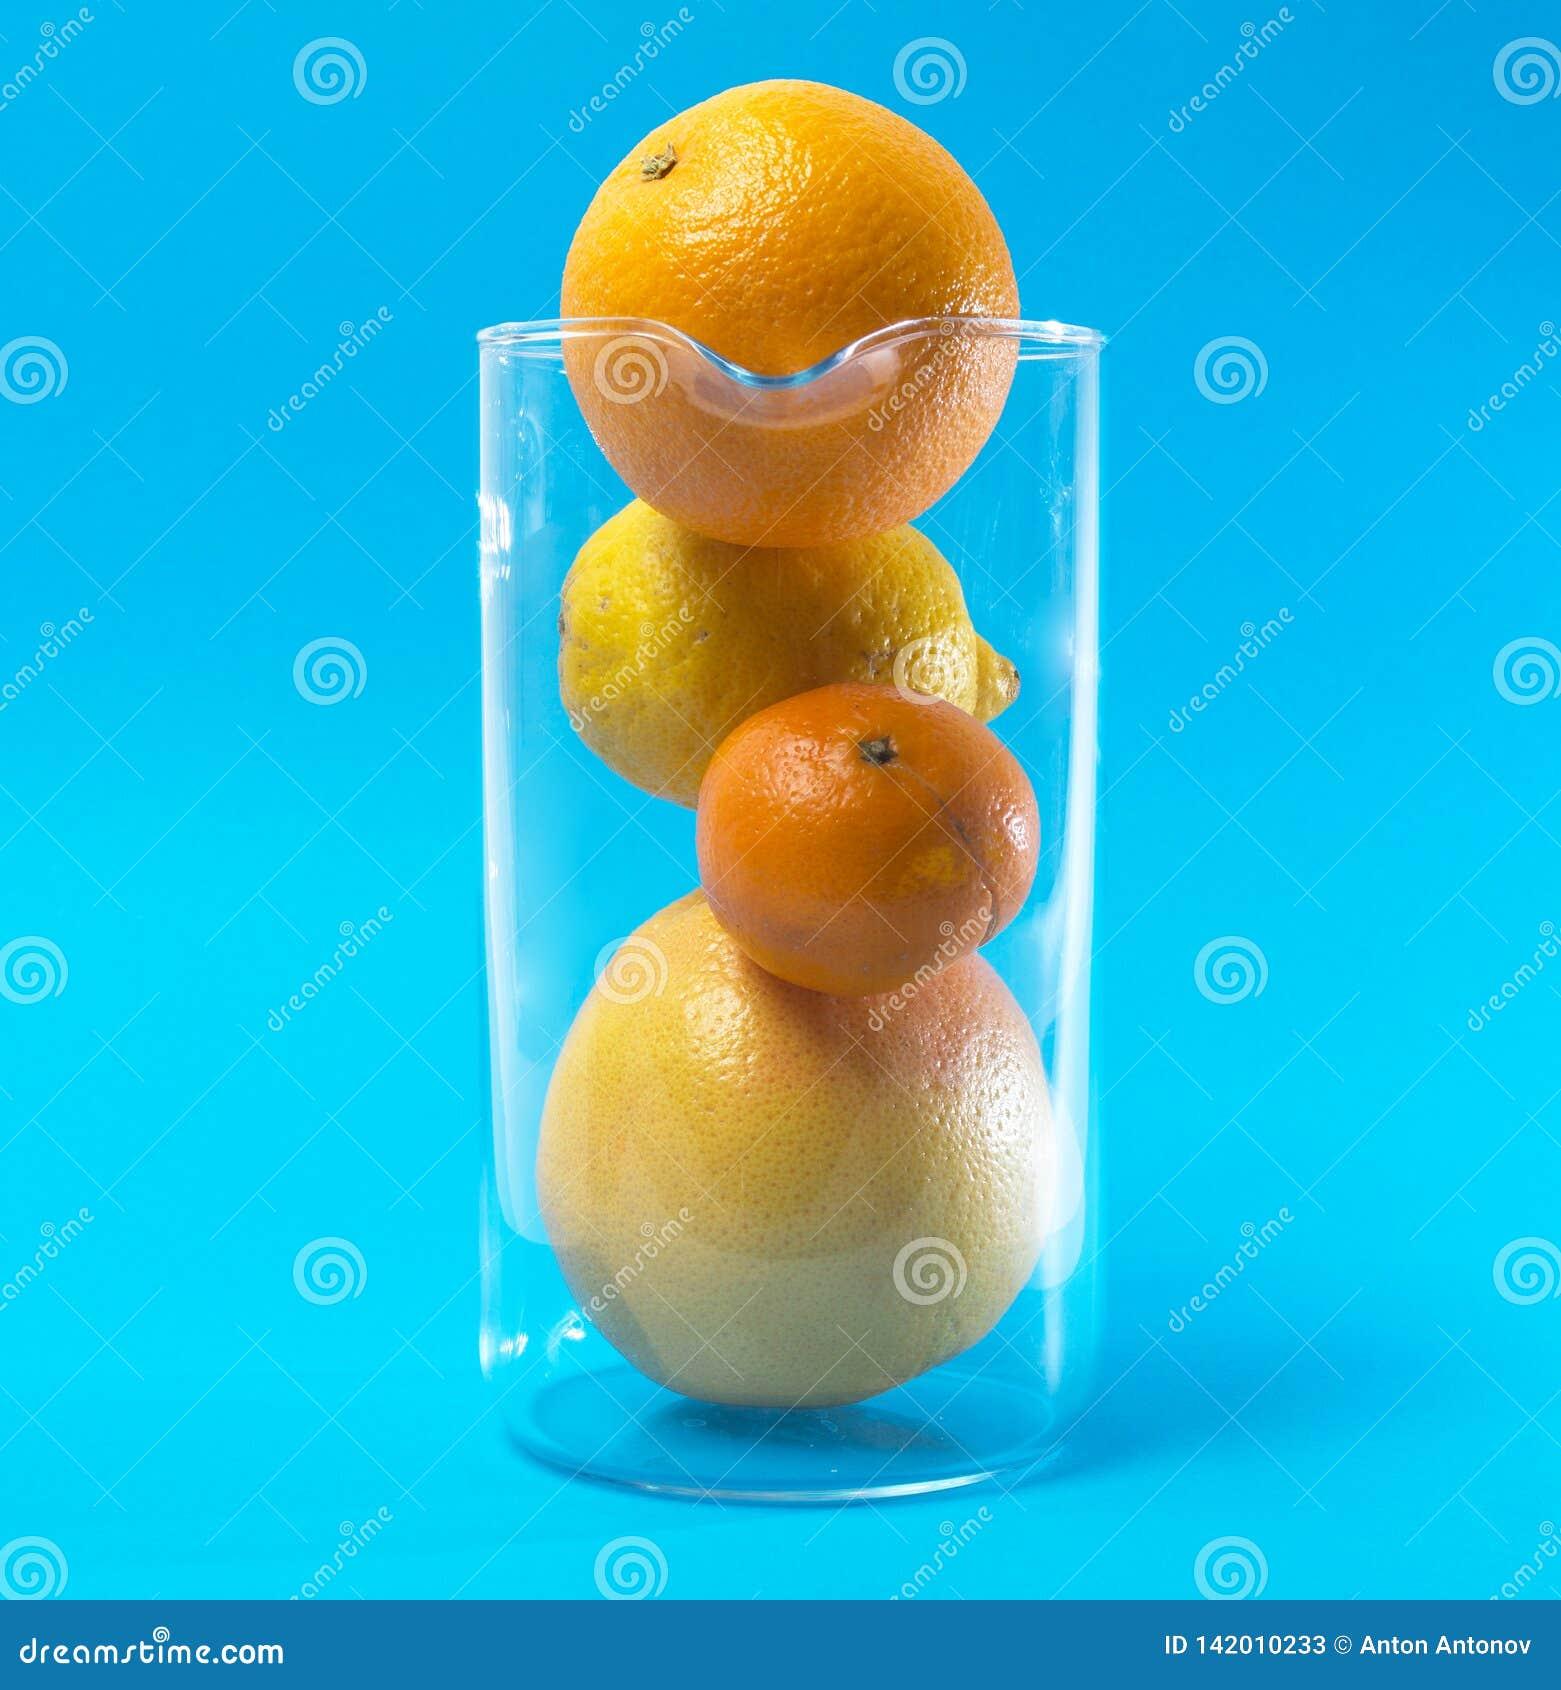 Fruits. Citrus.Fruit cocktail on a blue background.